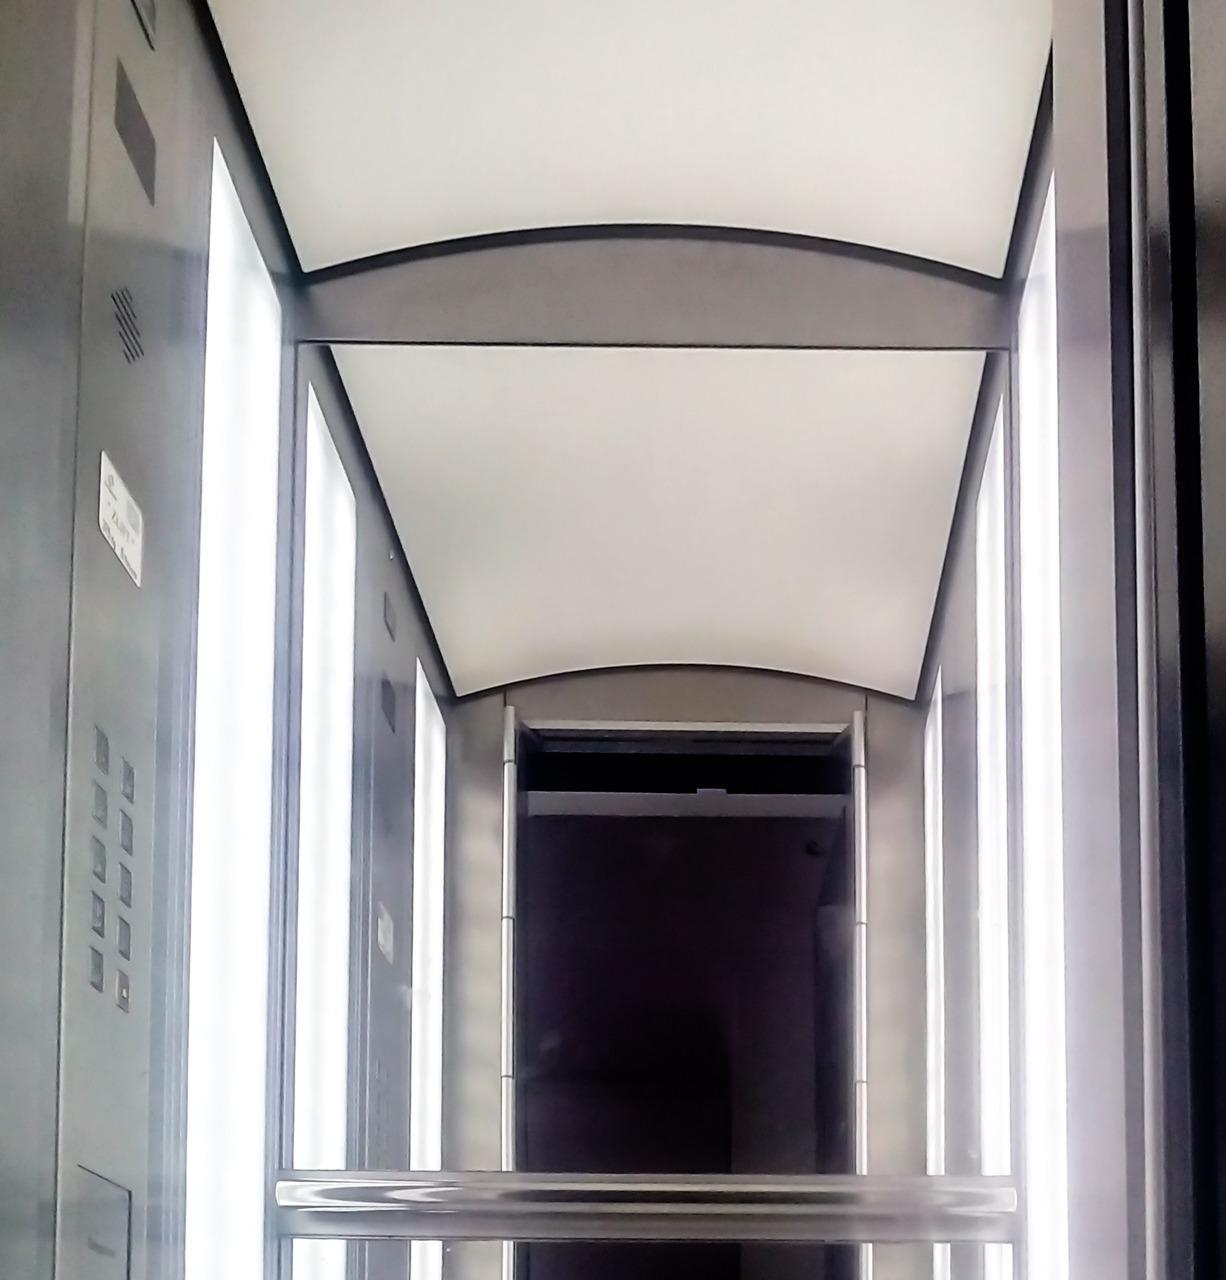 zlift-erga-lifts-31 Εγκατάσταση Ανελκυστήρα - Ρόδος